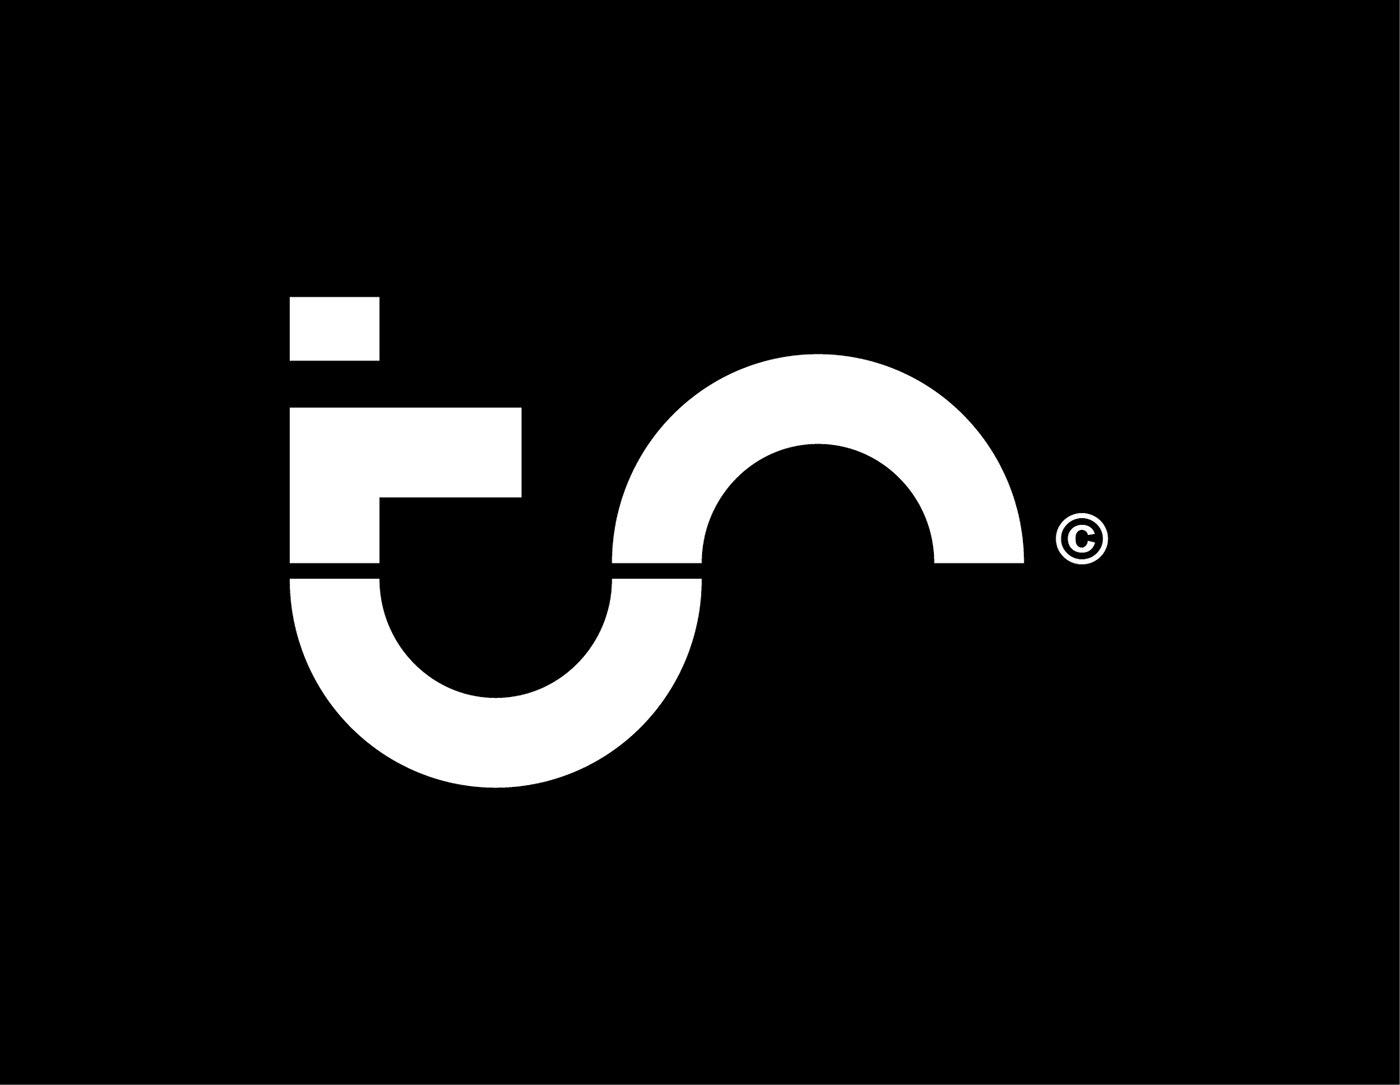 agency brand branding  creative design graphic design  identity ILLUSTRATION  logo typography